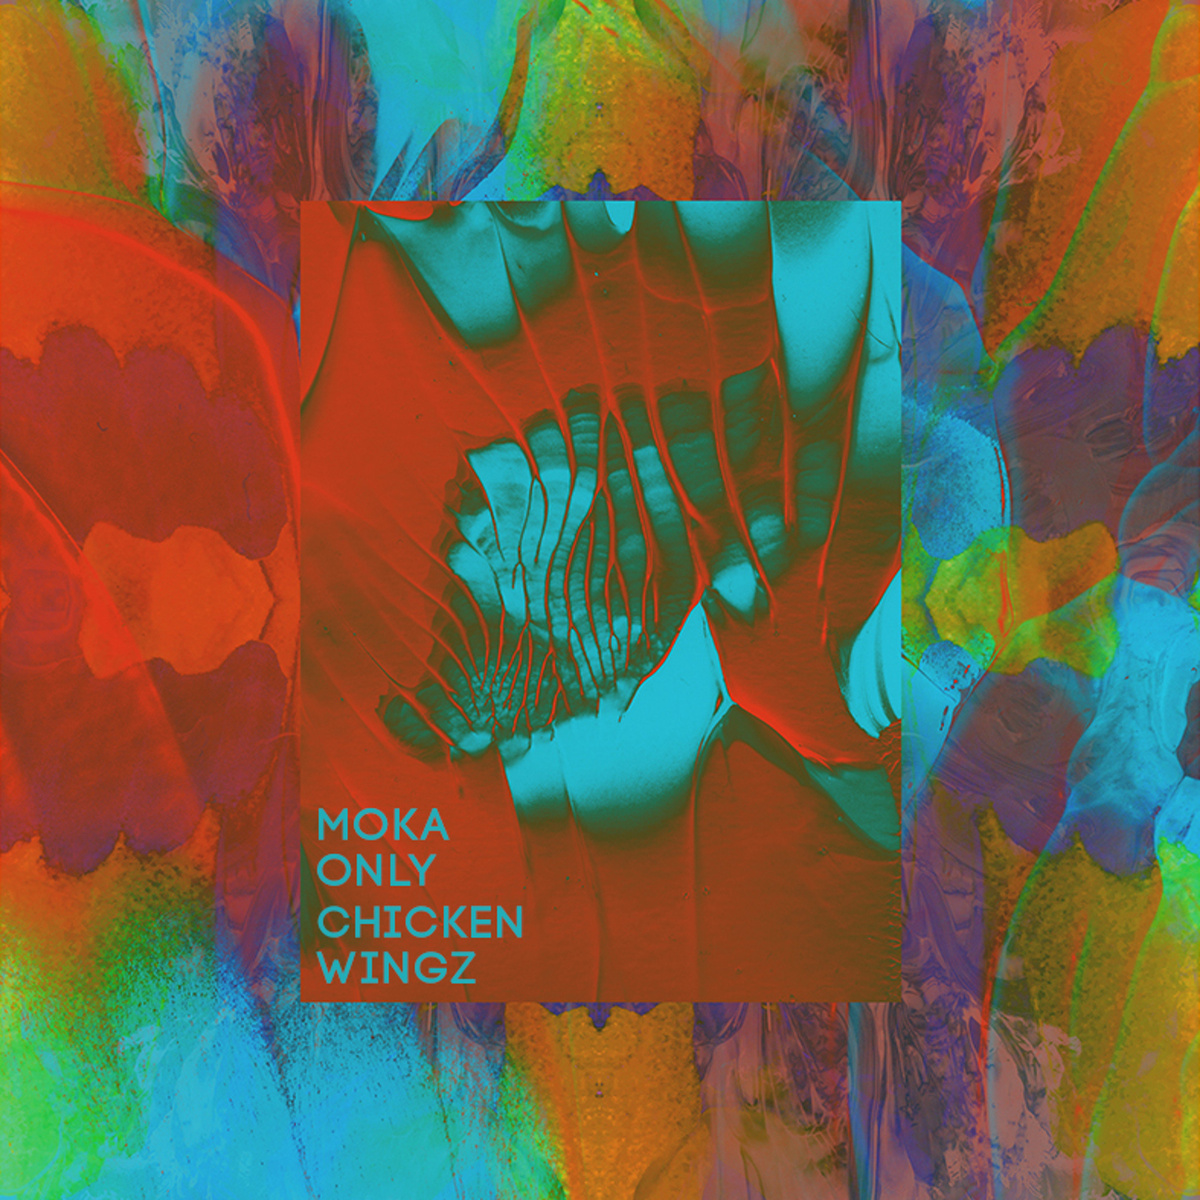 Listen: Moka Only – Chicken Wingz